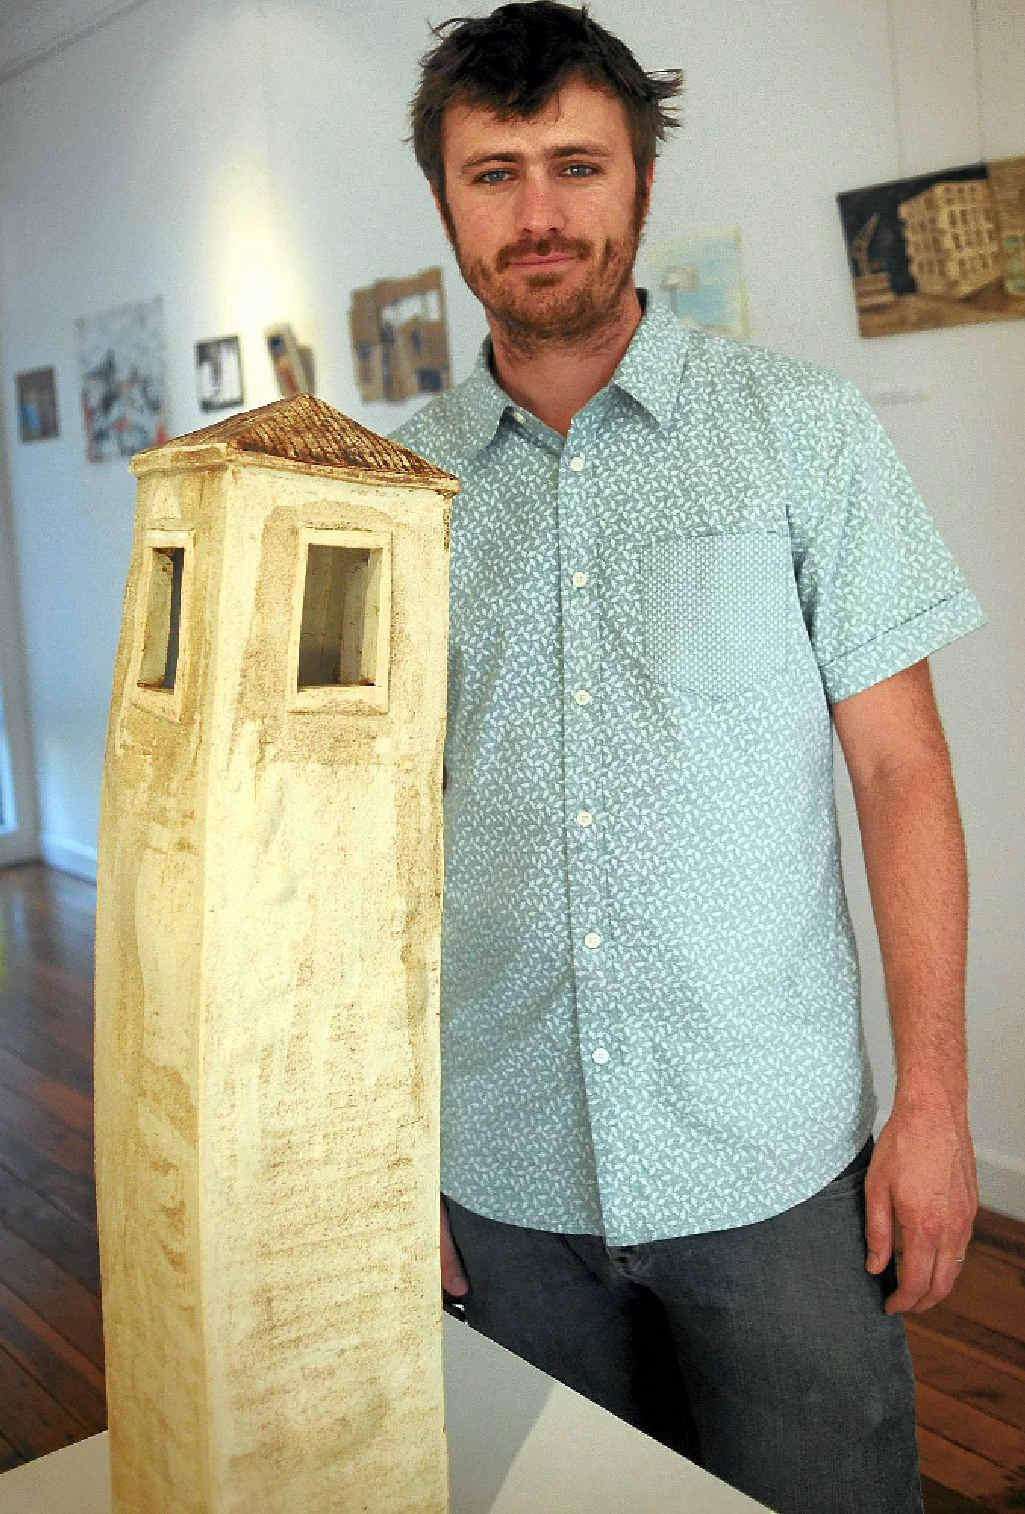 GRAND OPENING: Tim Fry opens his exhibition Habitat at Blockwork Gallery.